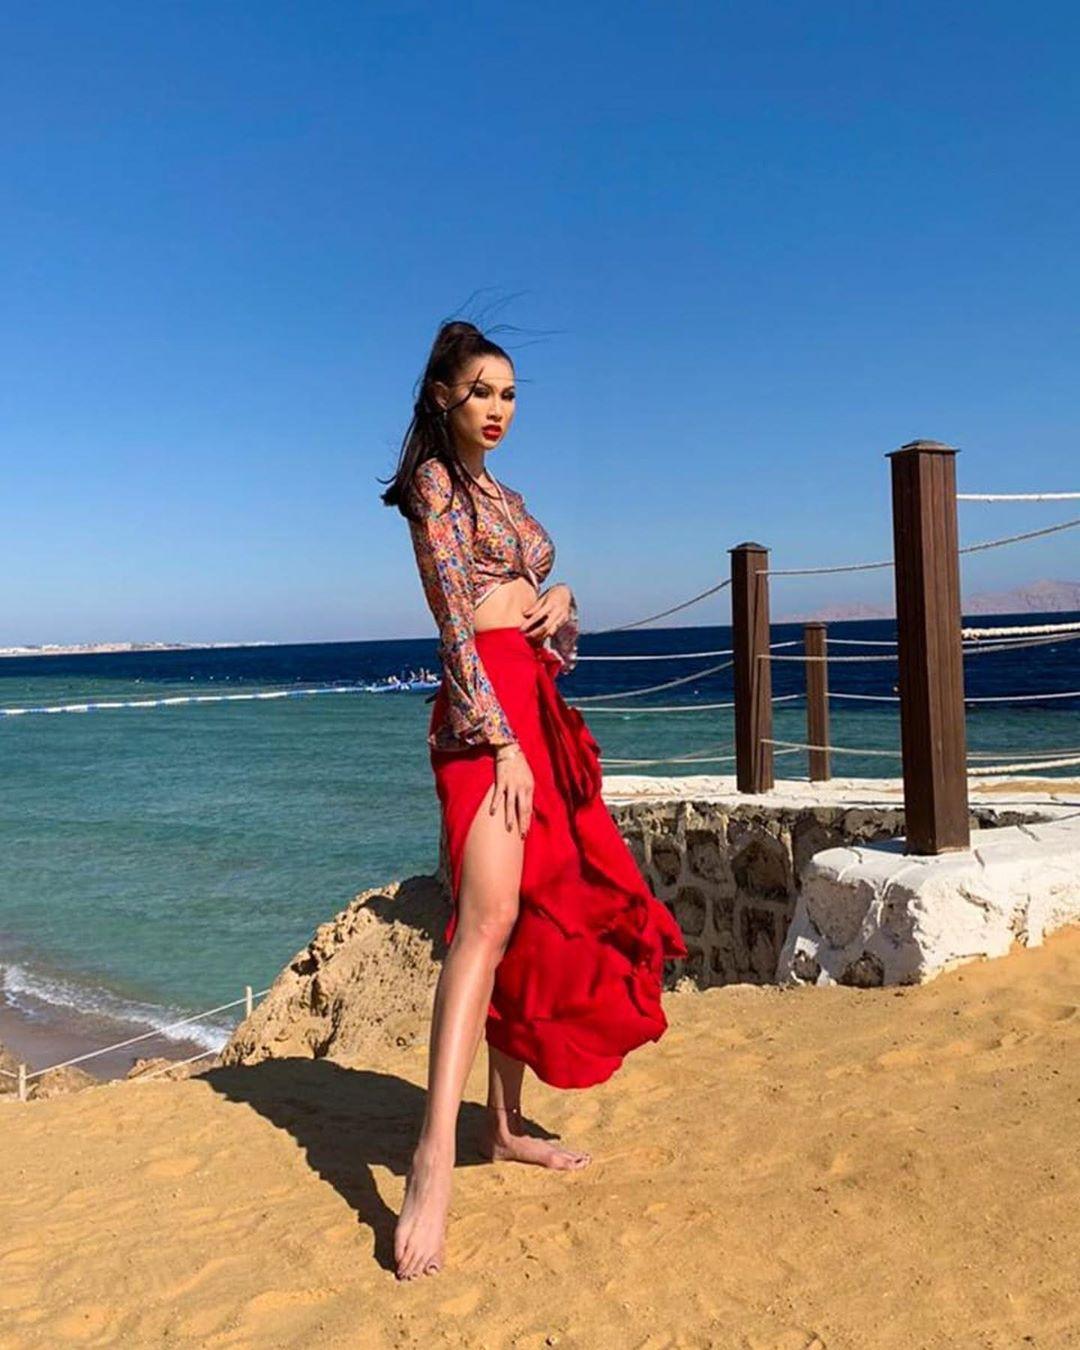 yoko chong, 4th runner-up de miss intercontinental 2019. - Página 5 77254710